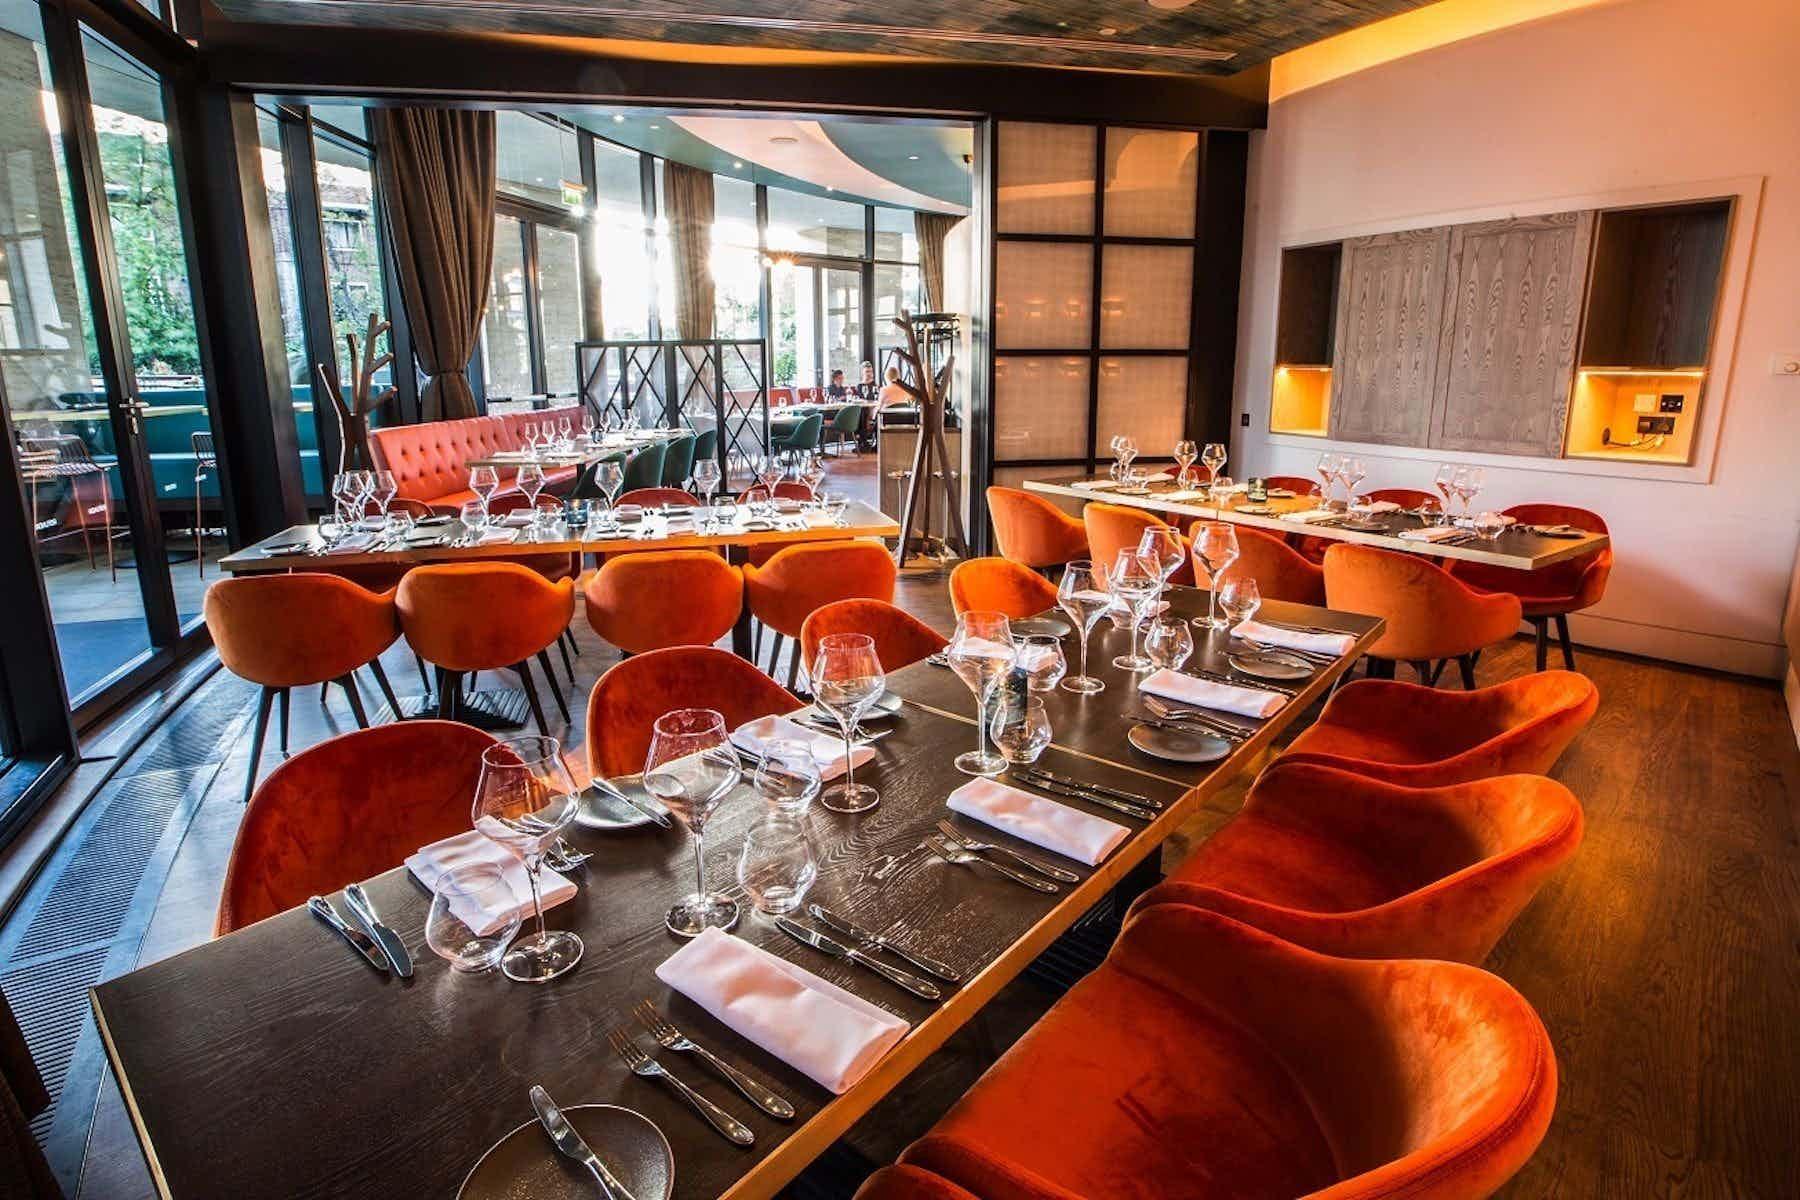 Restaurant & Private Dining Room, Rotunda